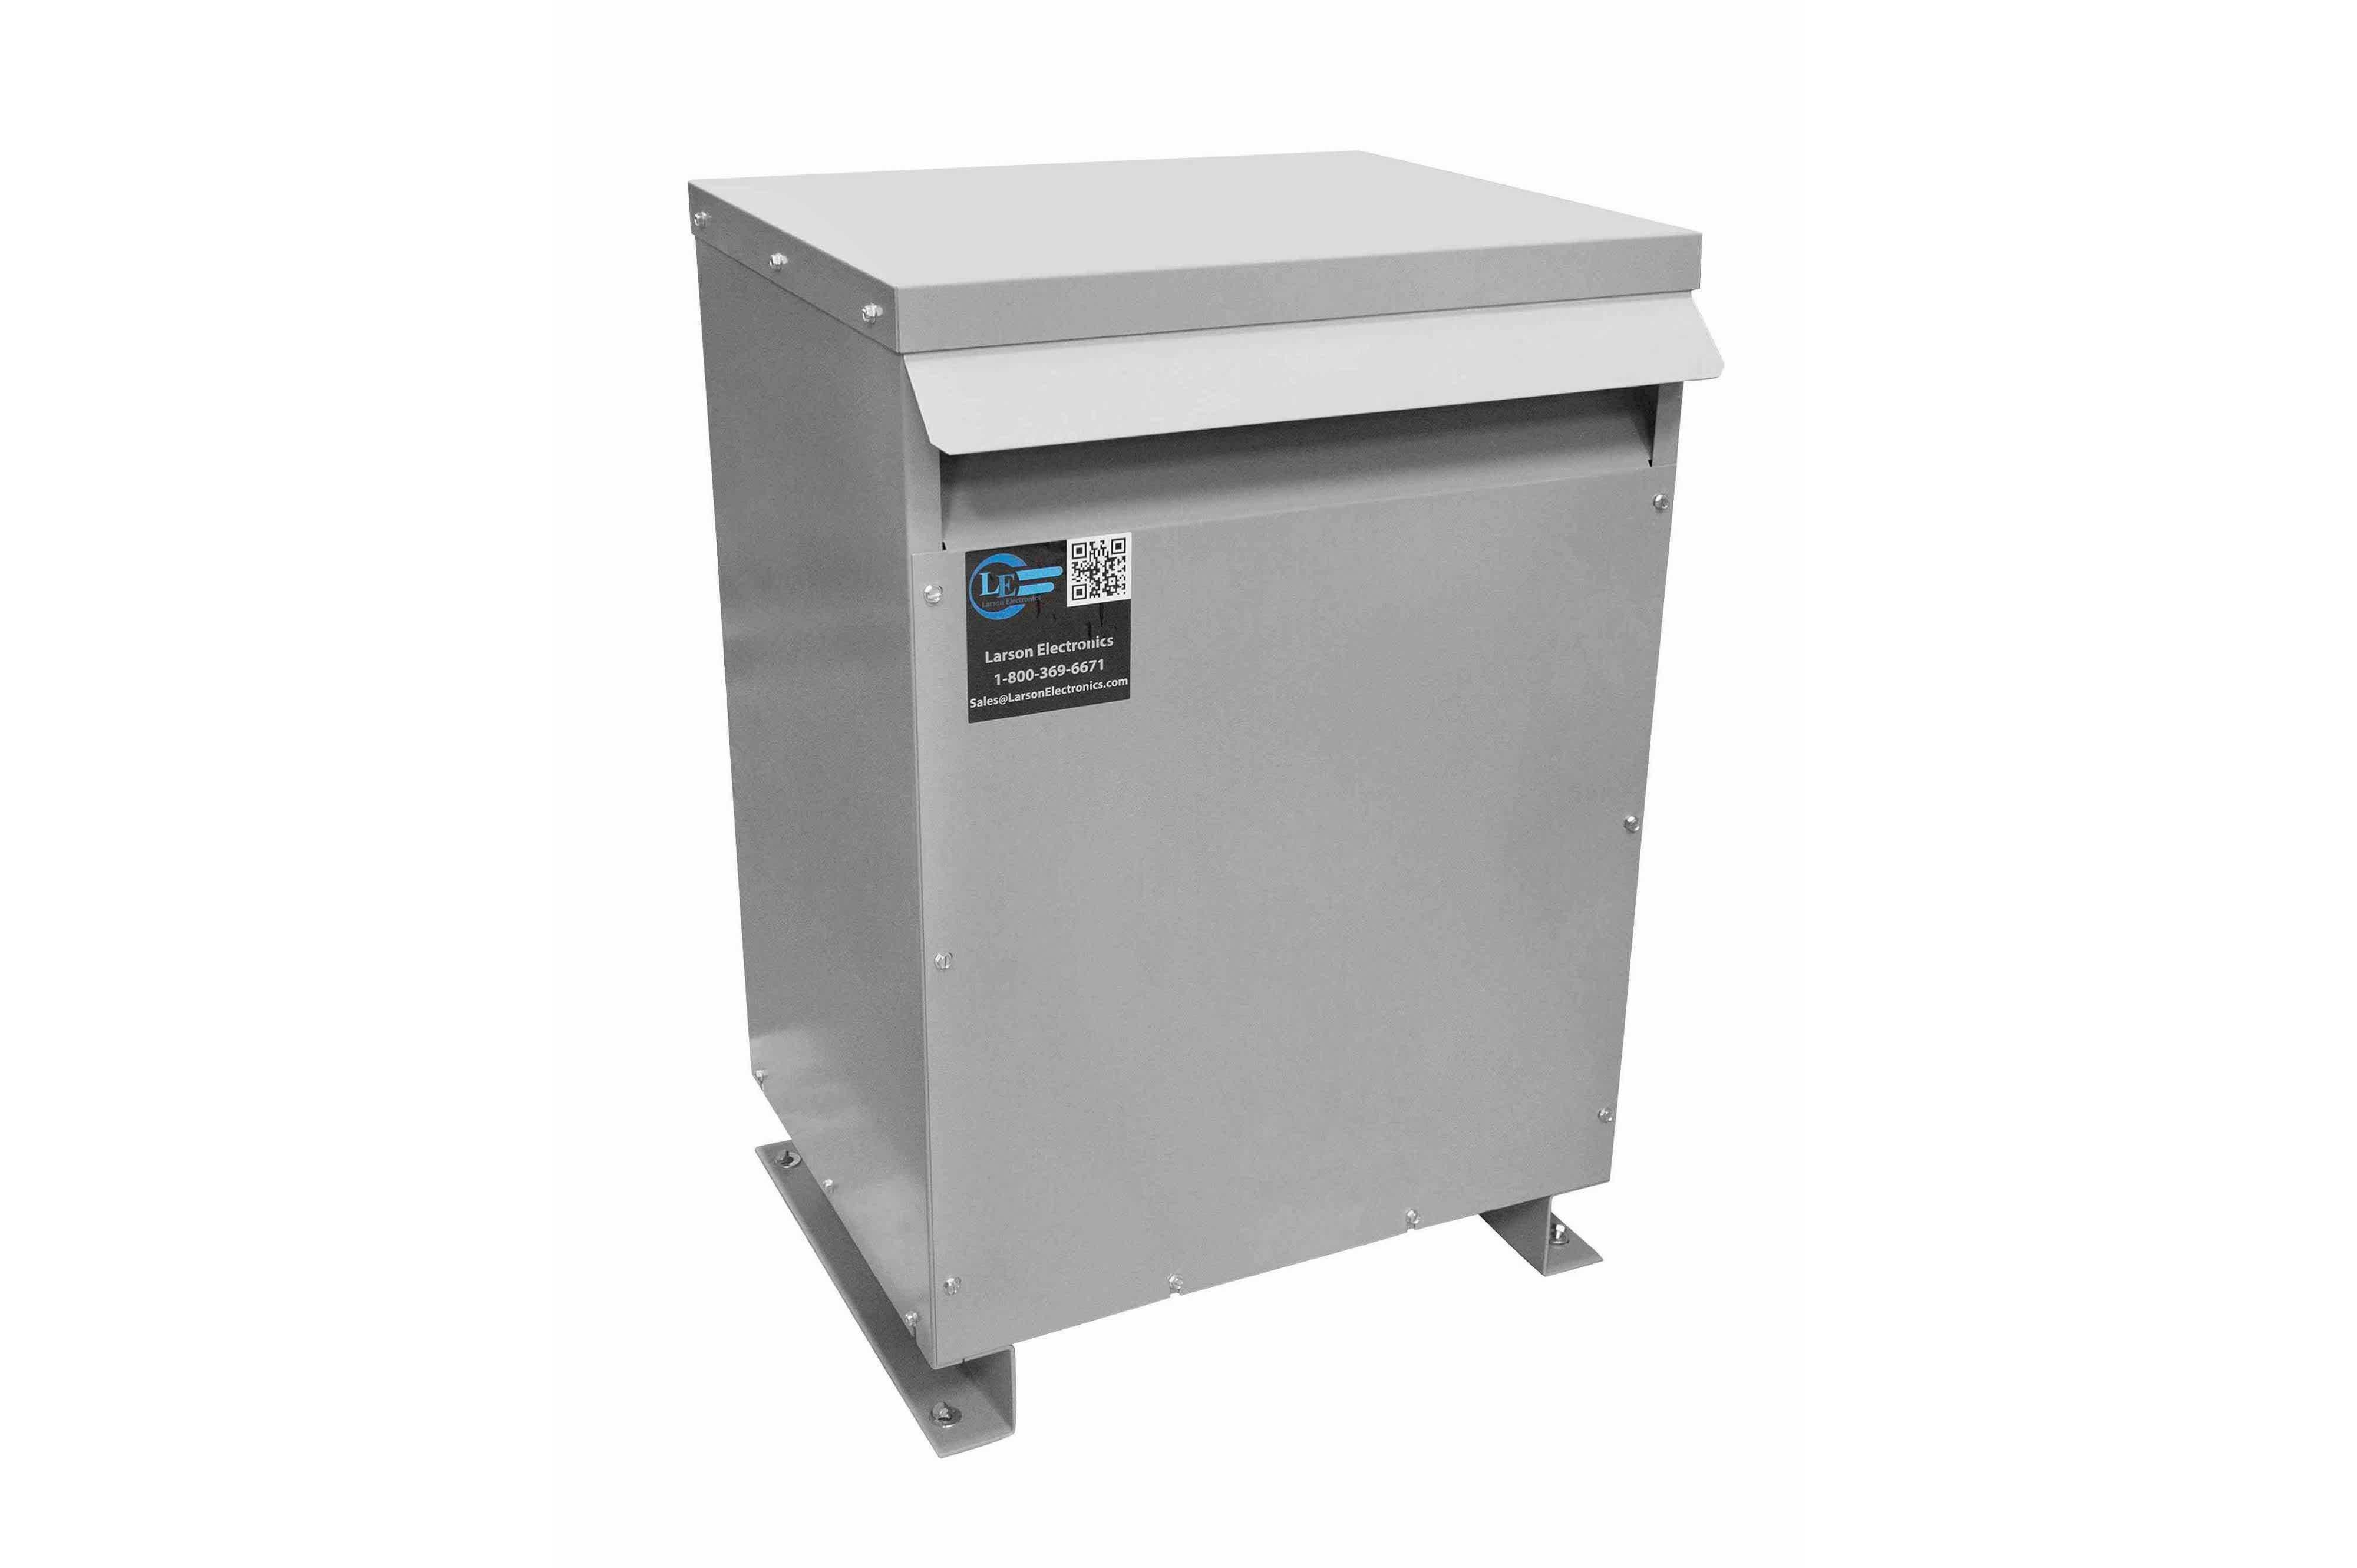 26 kVA 3PH Isolation Transformer, 600V Wye Primary, 208V Delta Secondary, N3R, Ventilated, 60 Hz